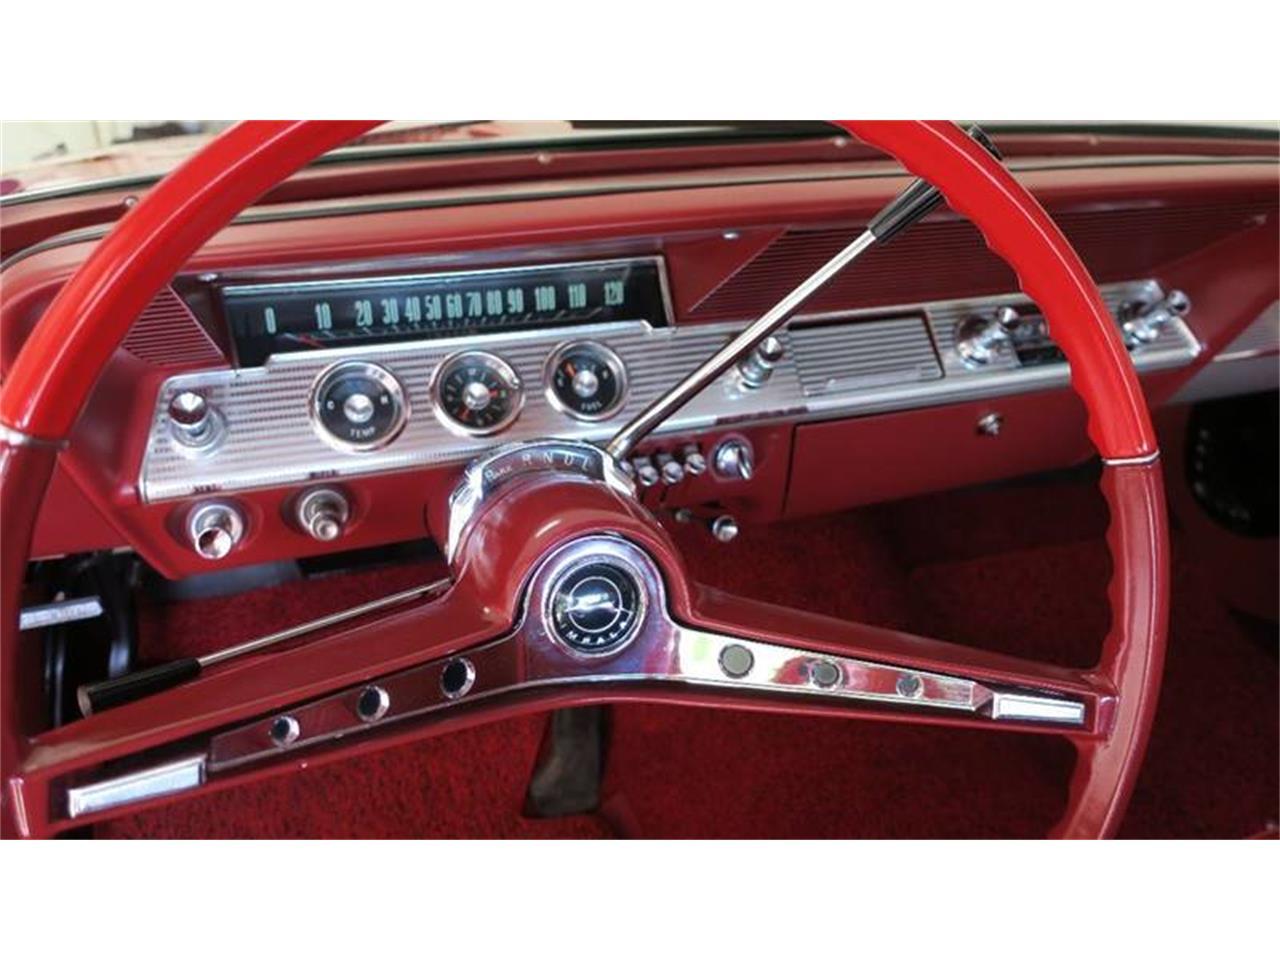 1962 Chevrolet Impala (CC-1216640) for sale in Clarksburg, Maryland